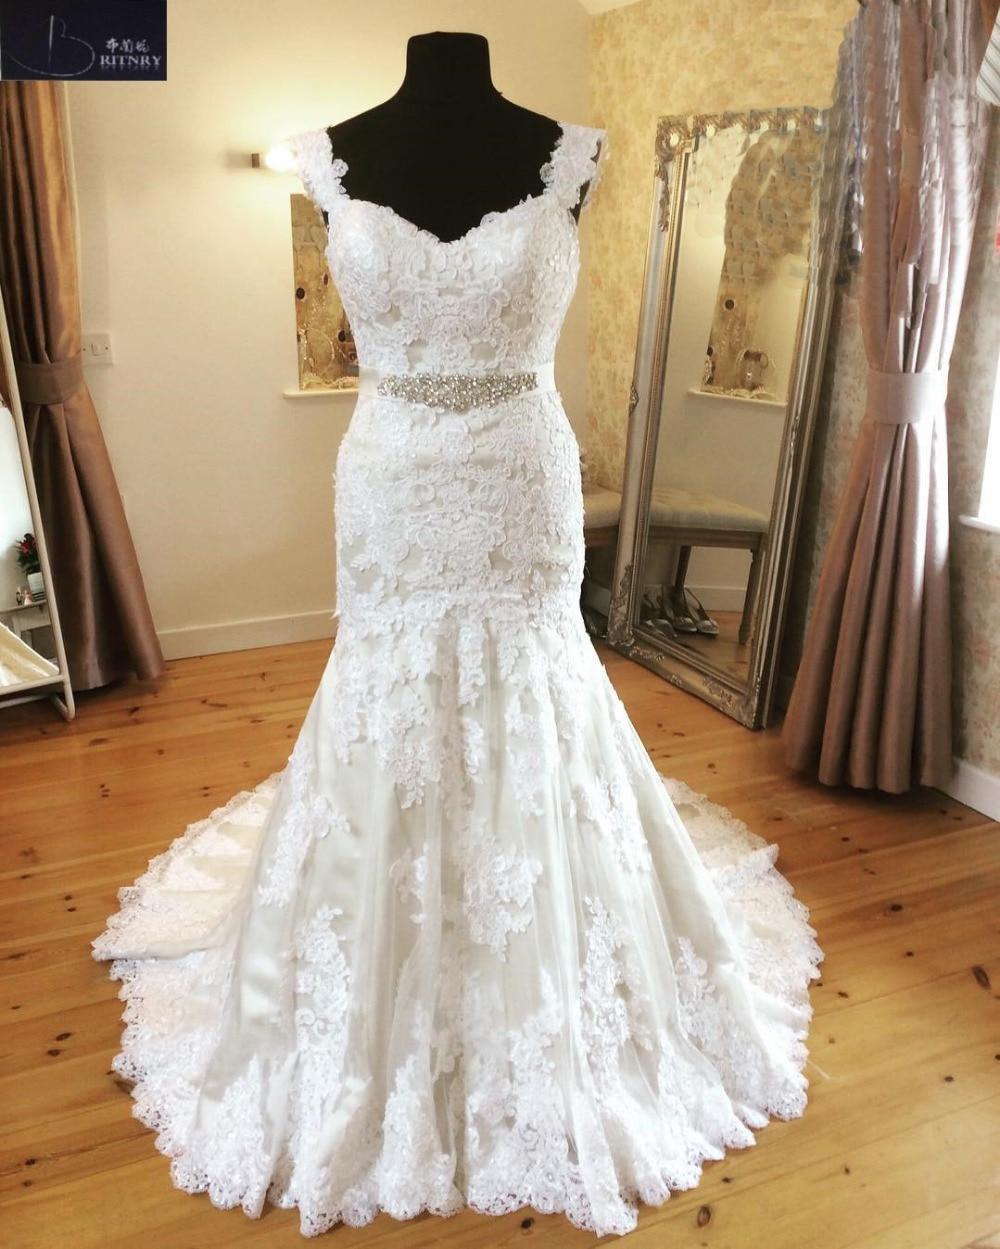 Lace Mermaid Wedding Dress: Aliexpress.com : Buy Charming Sweetheart Lace Mermaid